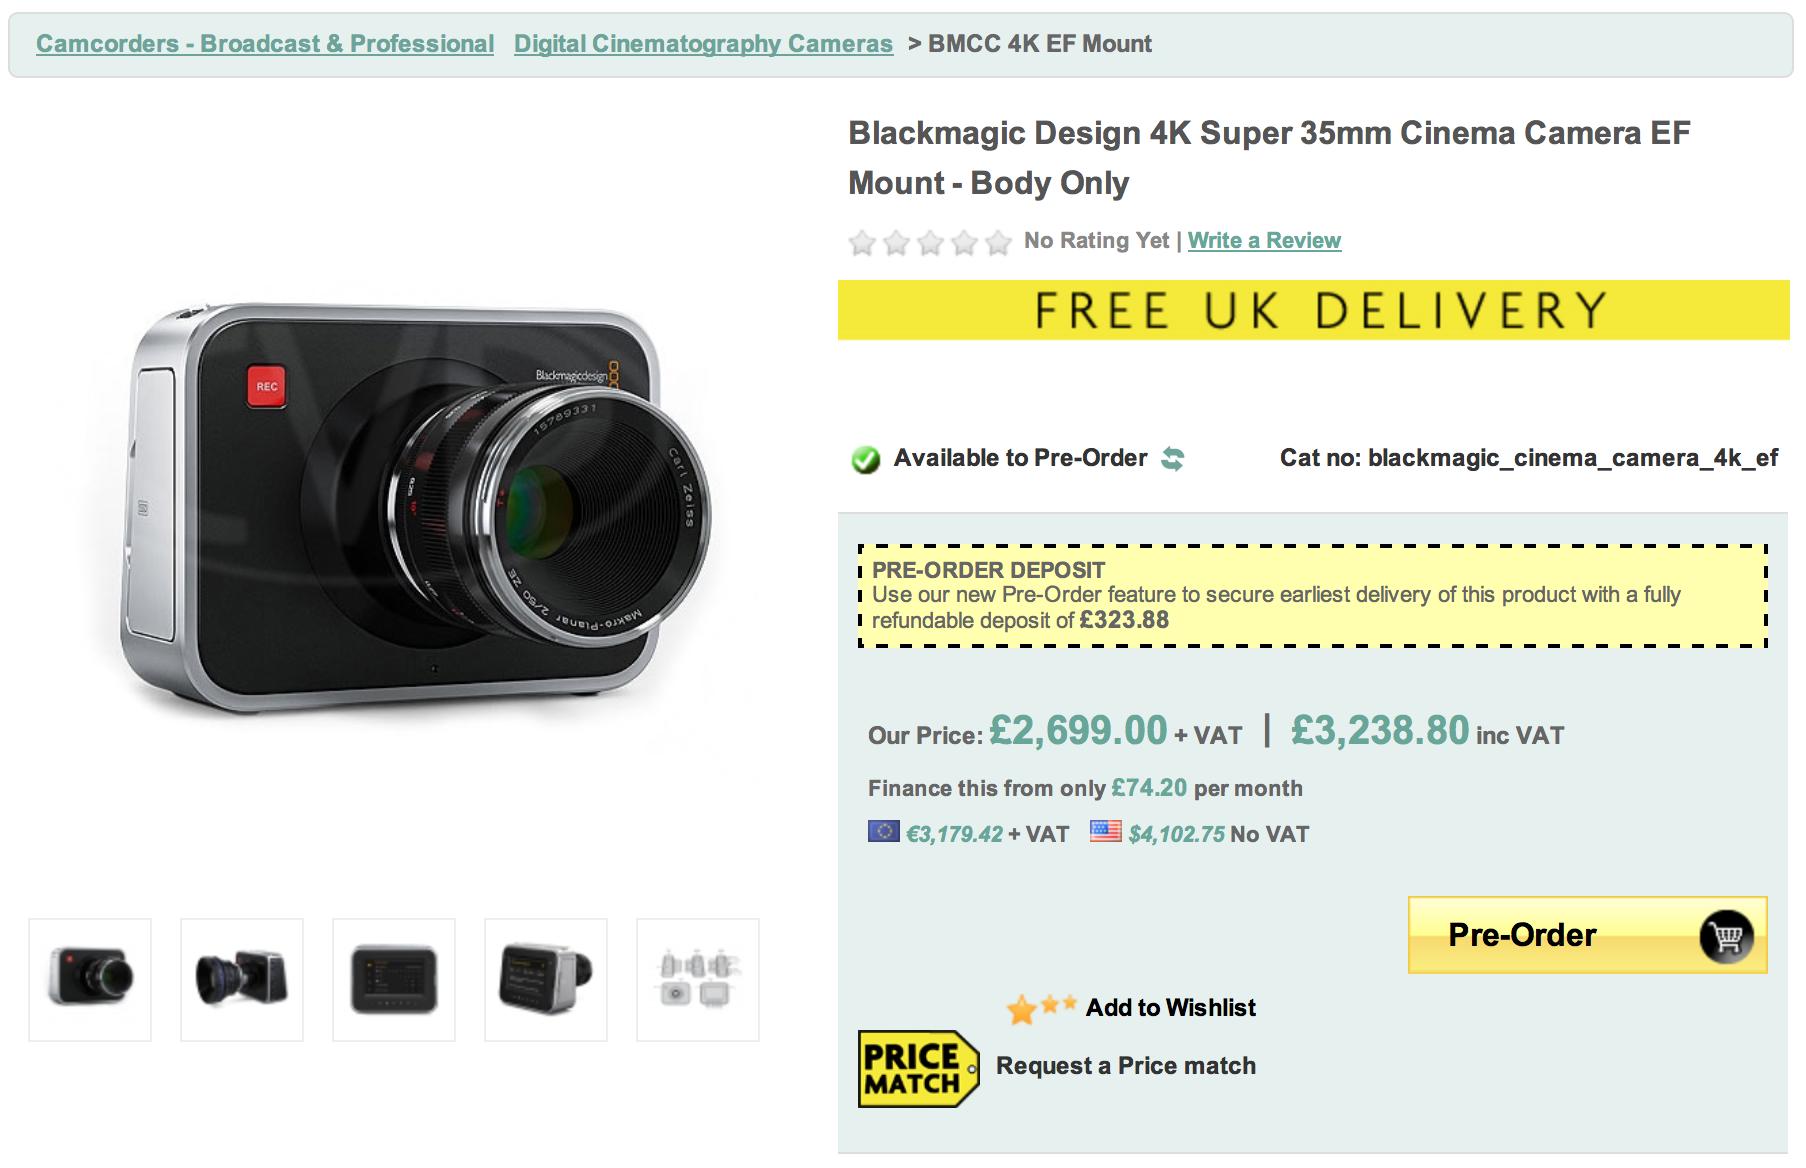 Blackmagic Design 4k Super 35mm Cinema Camera Ready To Pre